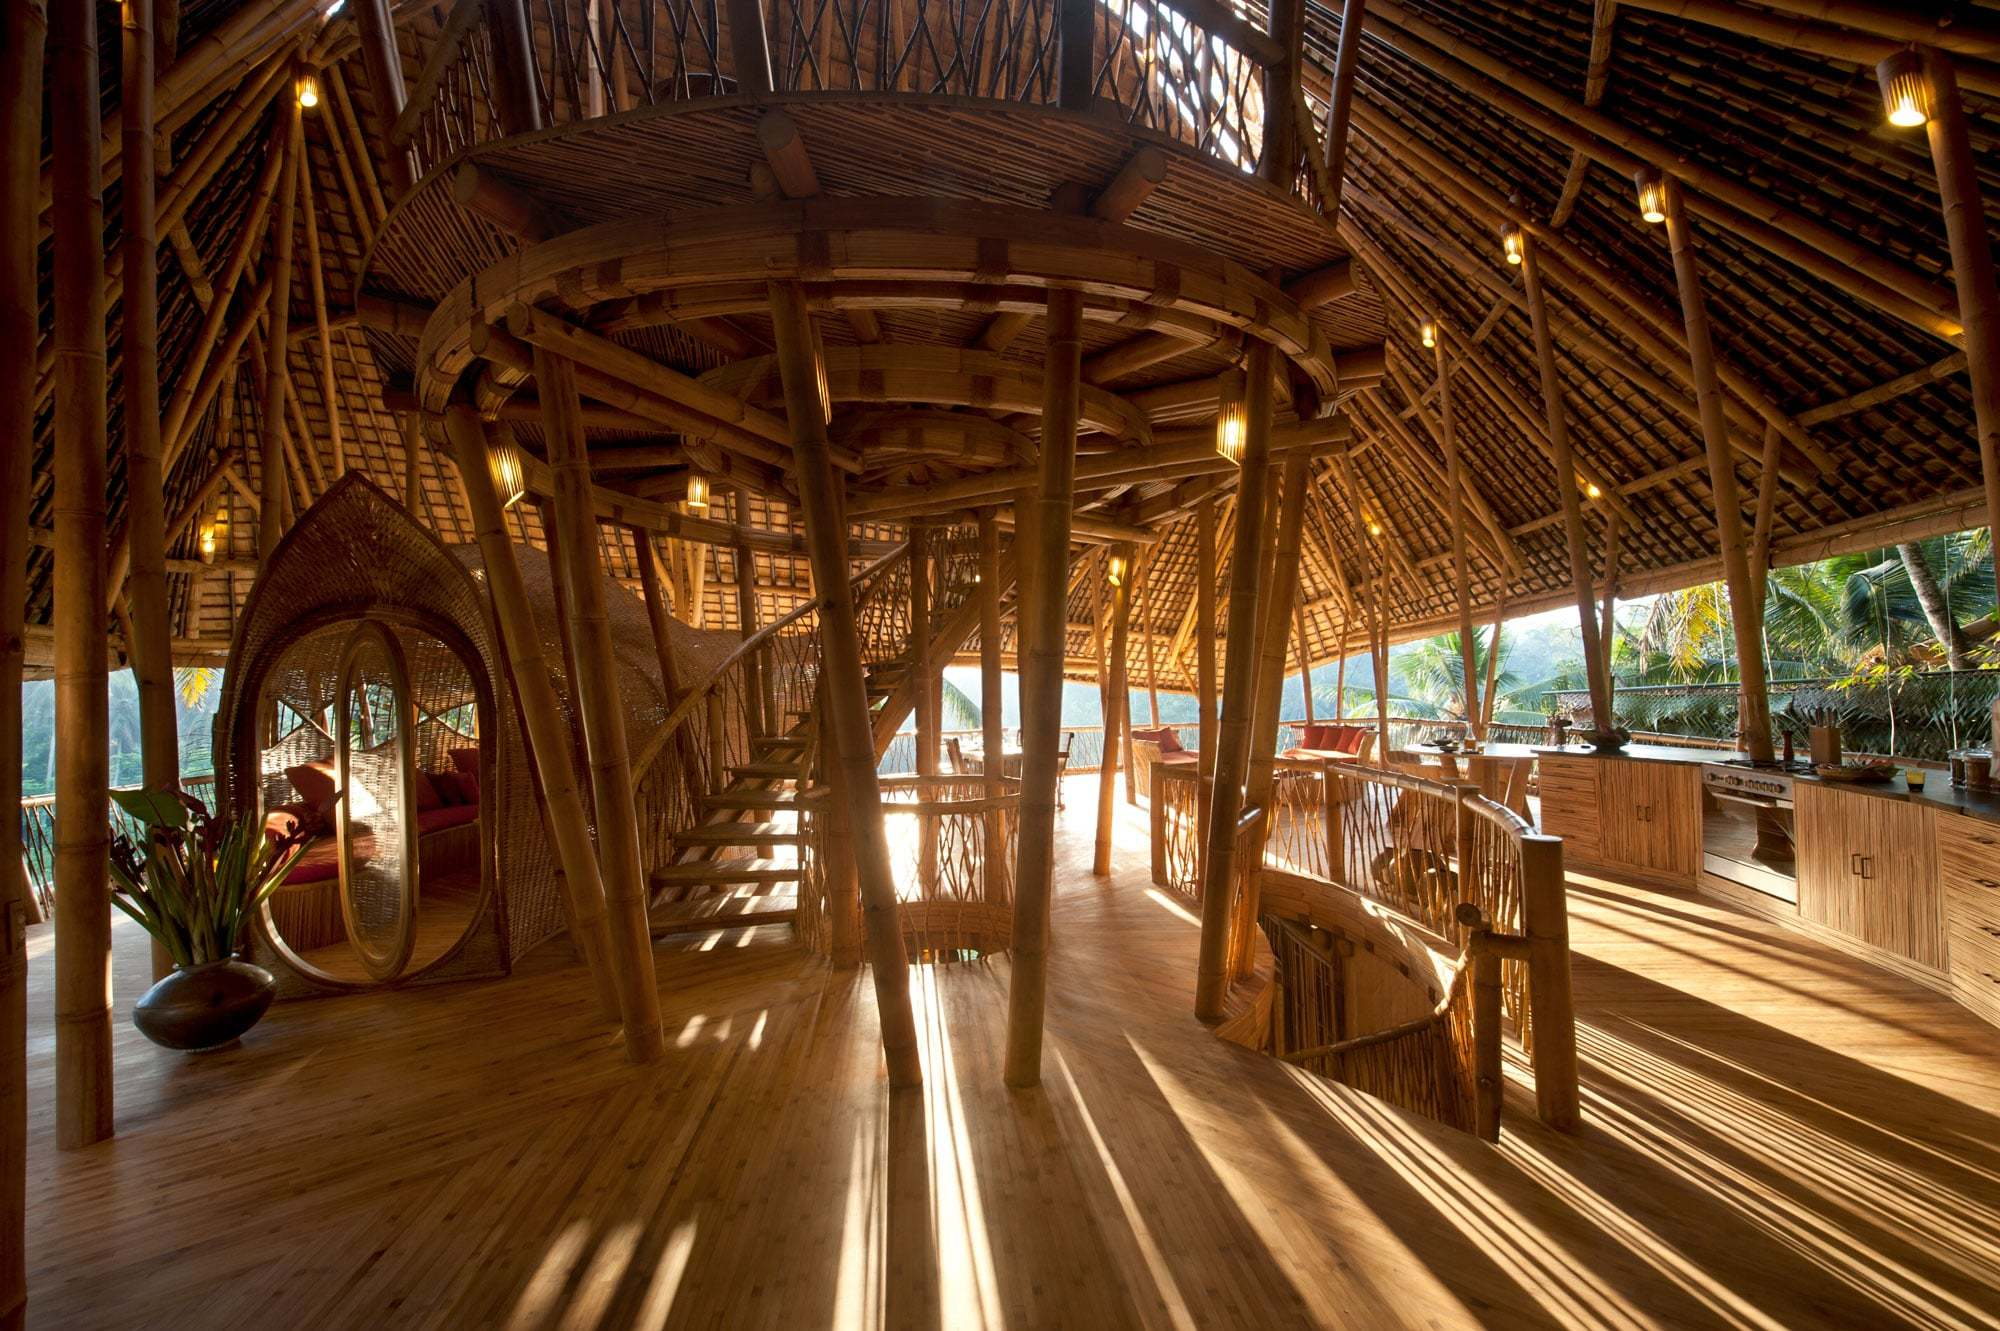 The Sunrise House at Green Village, Bali